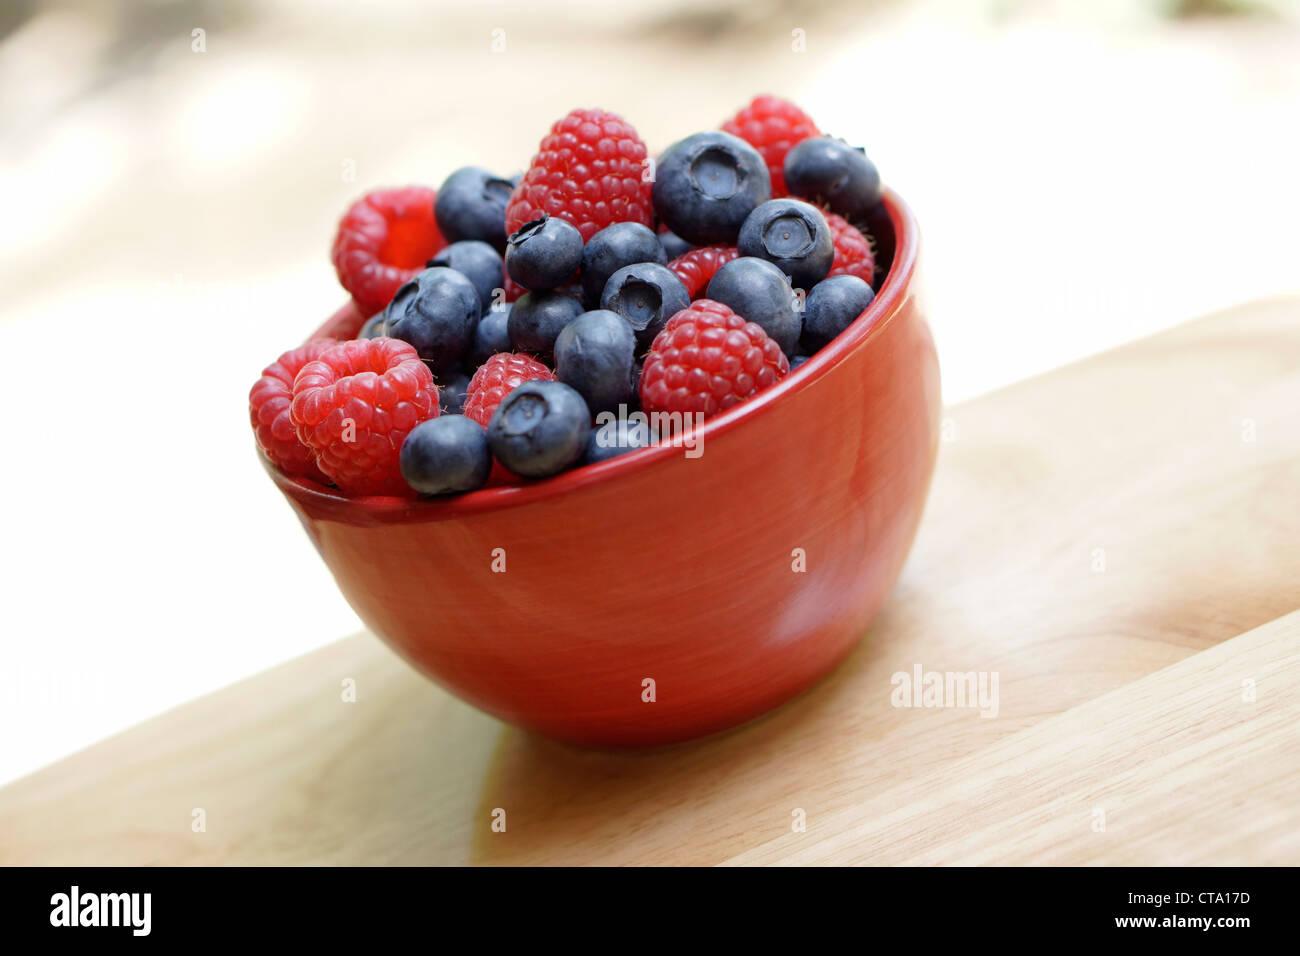 Bowl Fruit, Raspberries Blueberries - Stock Image